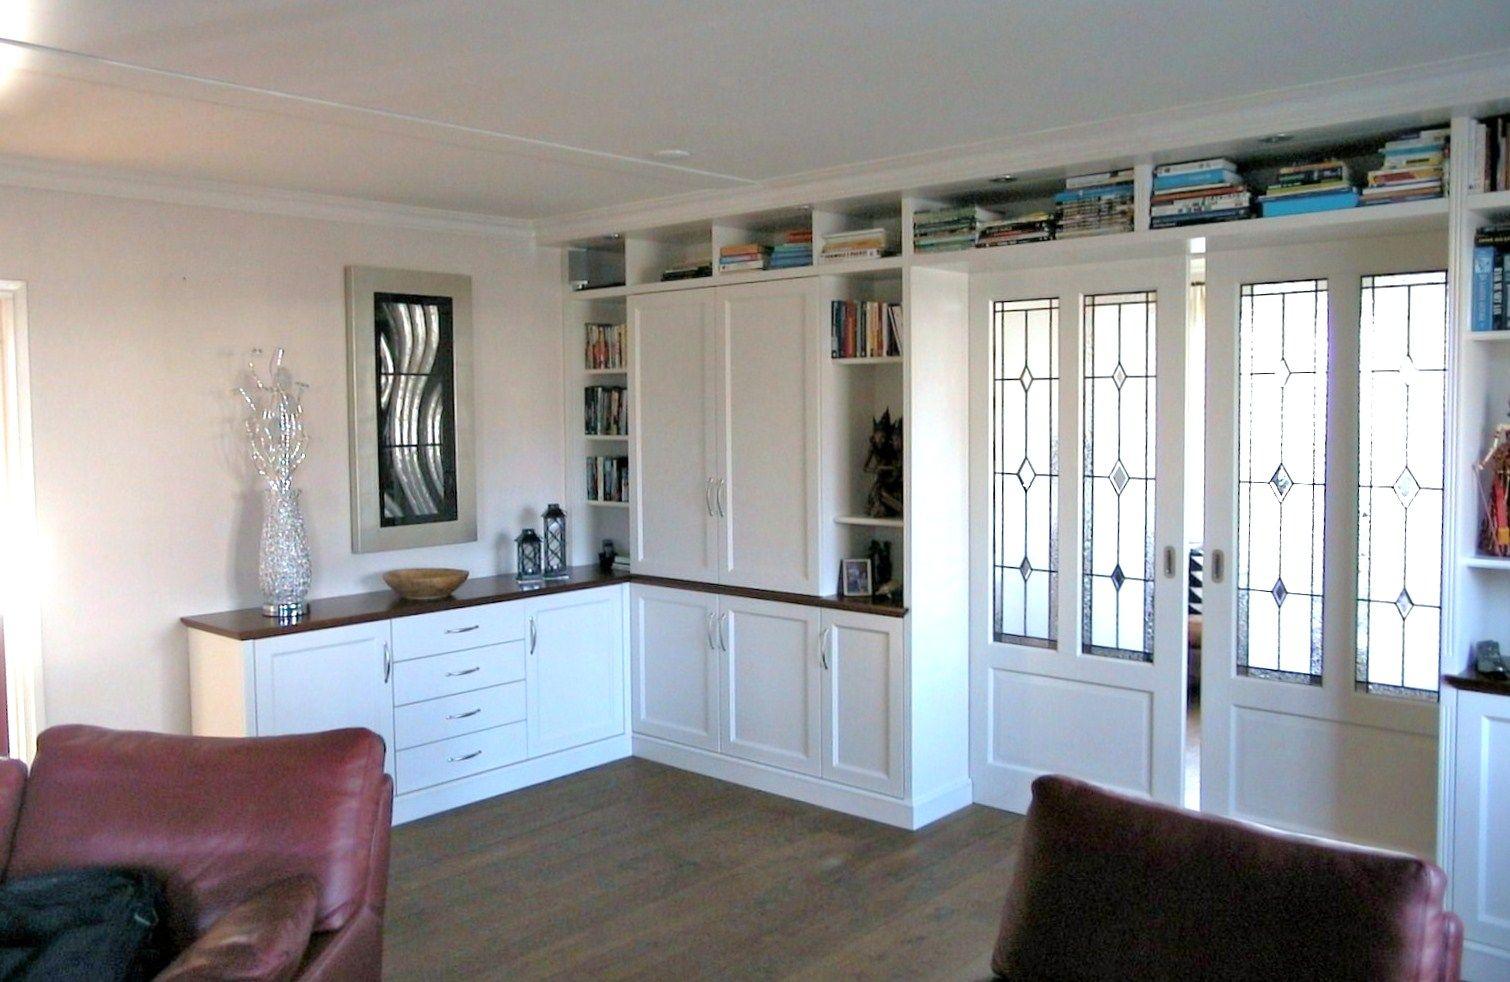 Kamer en suite met ensuite deuren en dressoir in engelse stijl